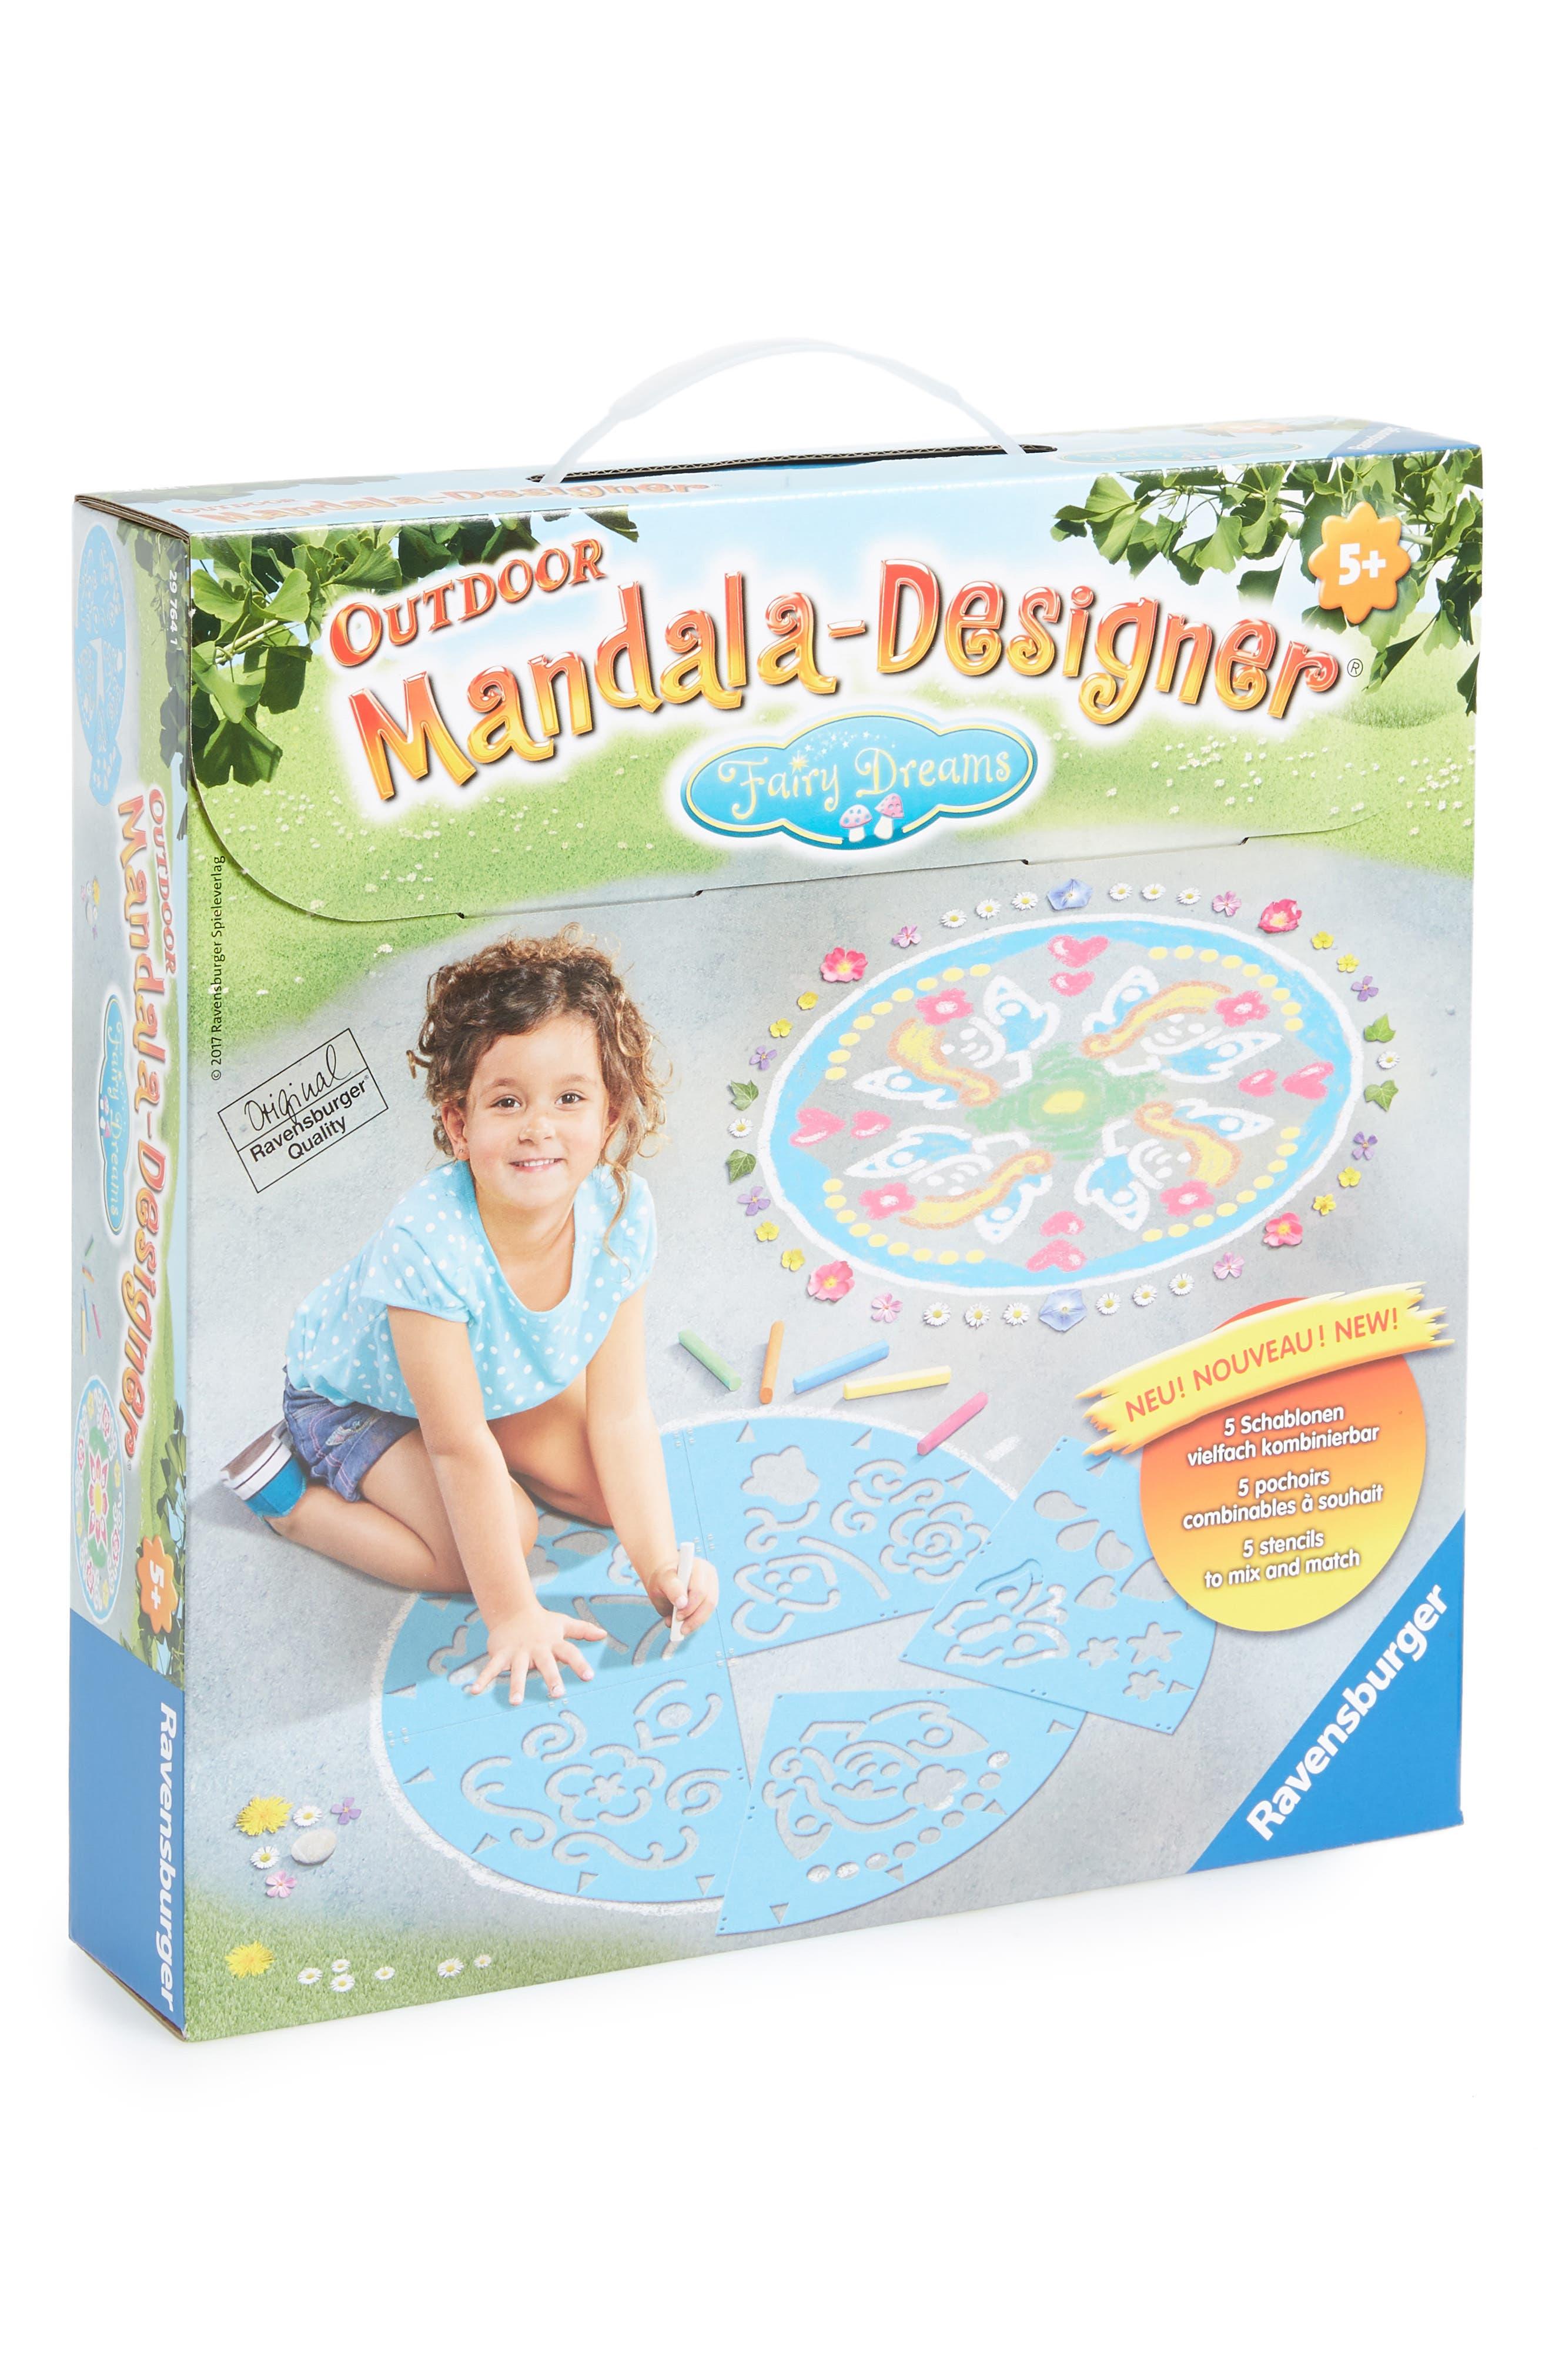 Outdoor Mandala Designer Fairy Dreams Chalk Kit,                             Main thumbnail 1, color,                             400